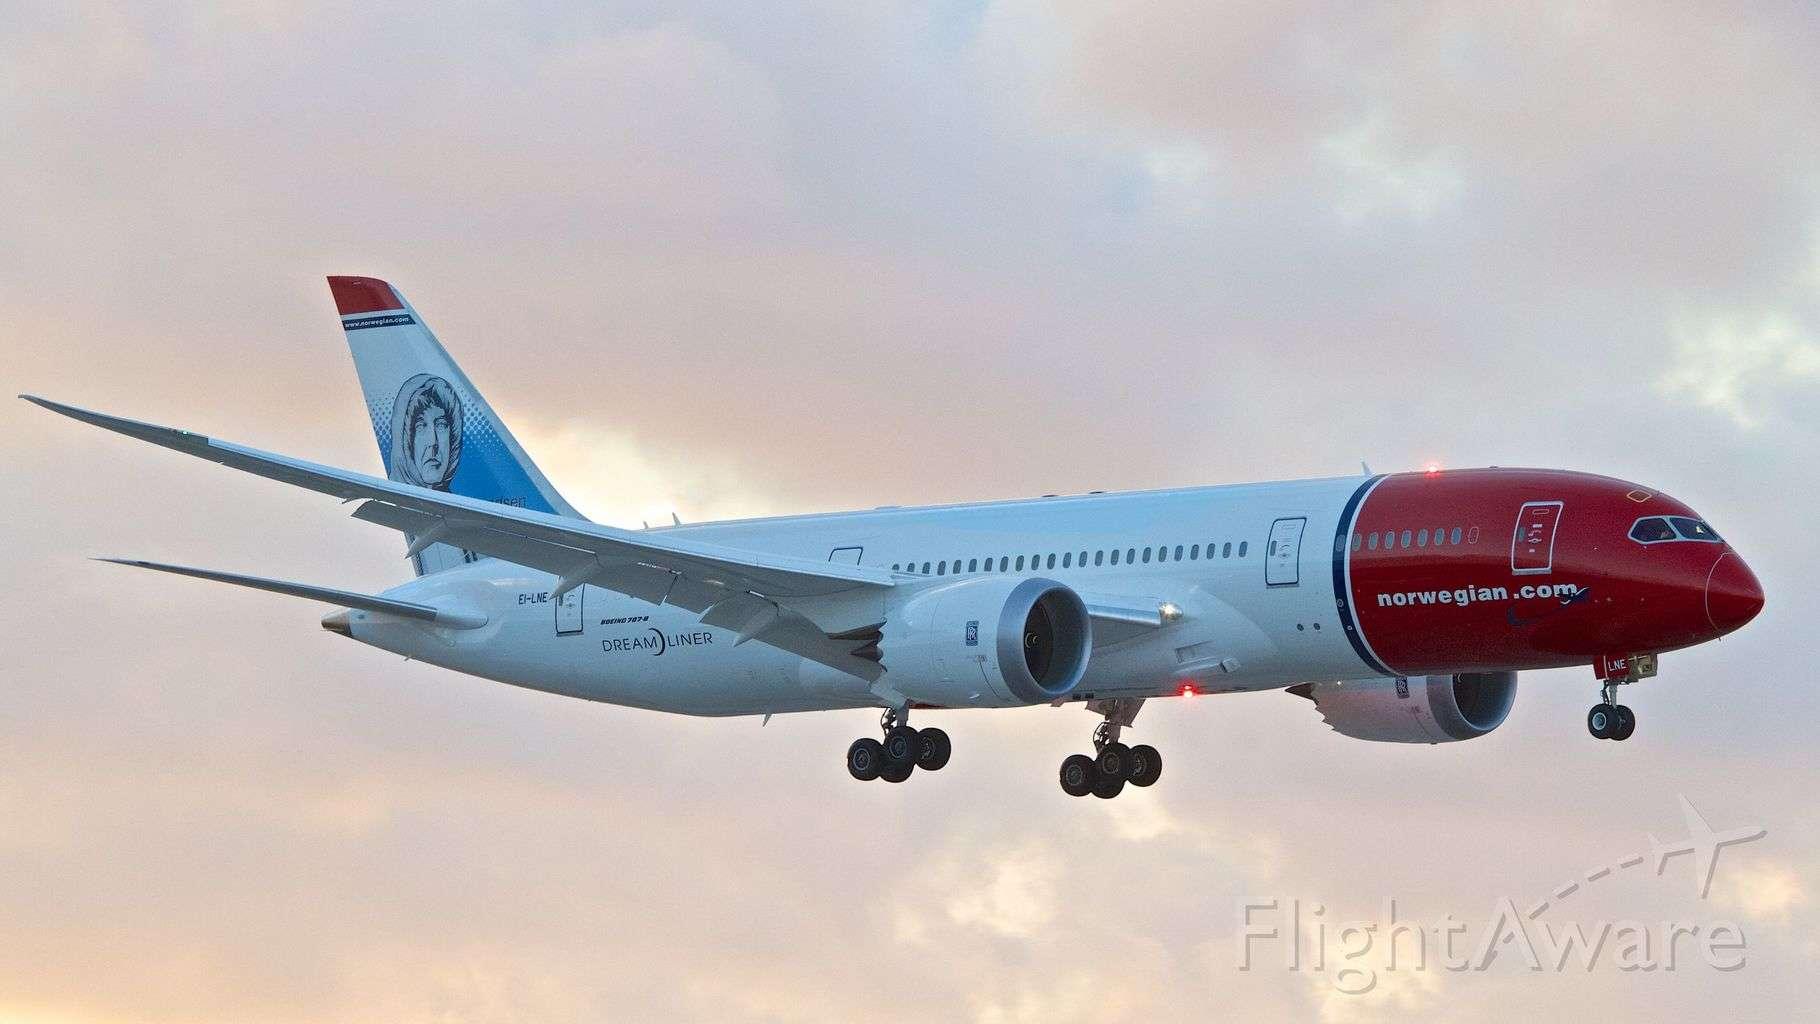 Boeing openly supports Norwegian Long Haul